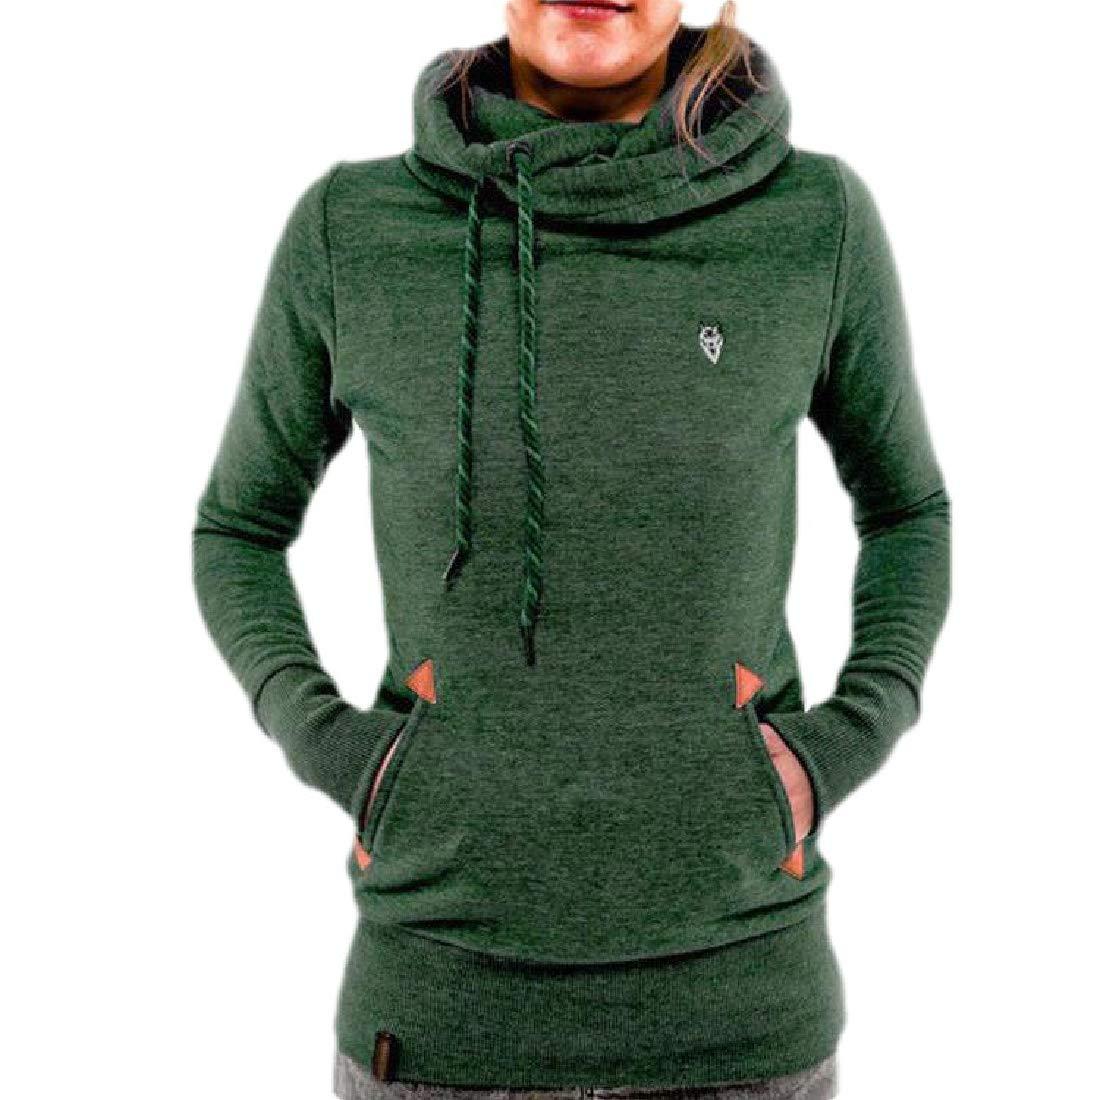 Domple Womens Plus Size Long Sleeve Pockets Fleece Pullover Hooded Sweatshirts